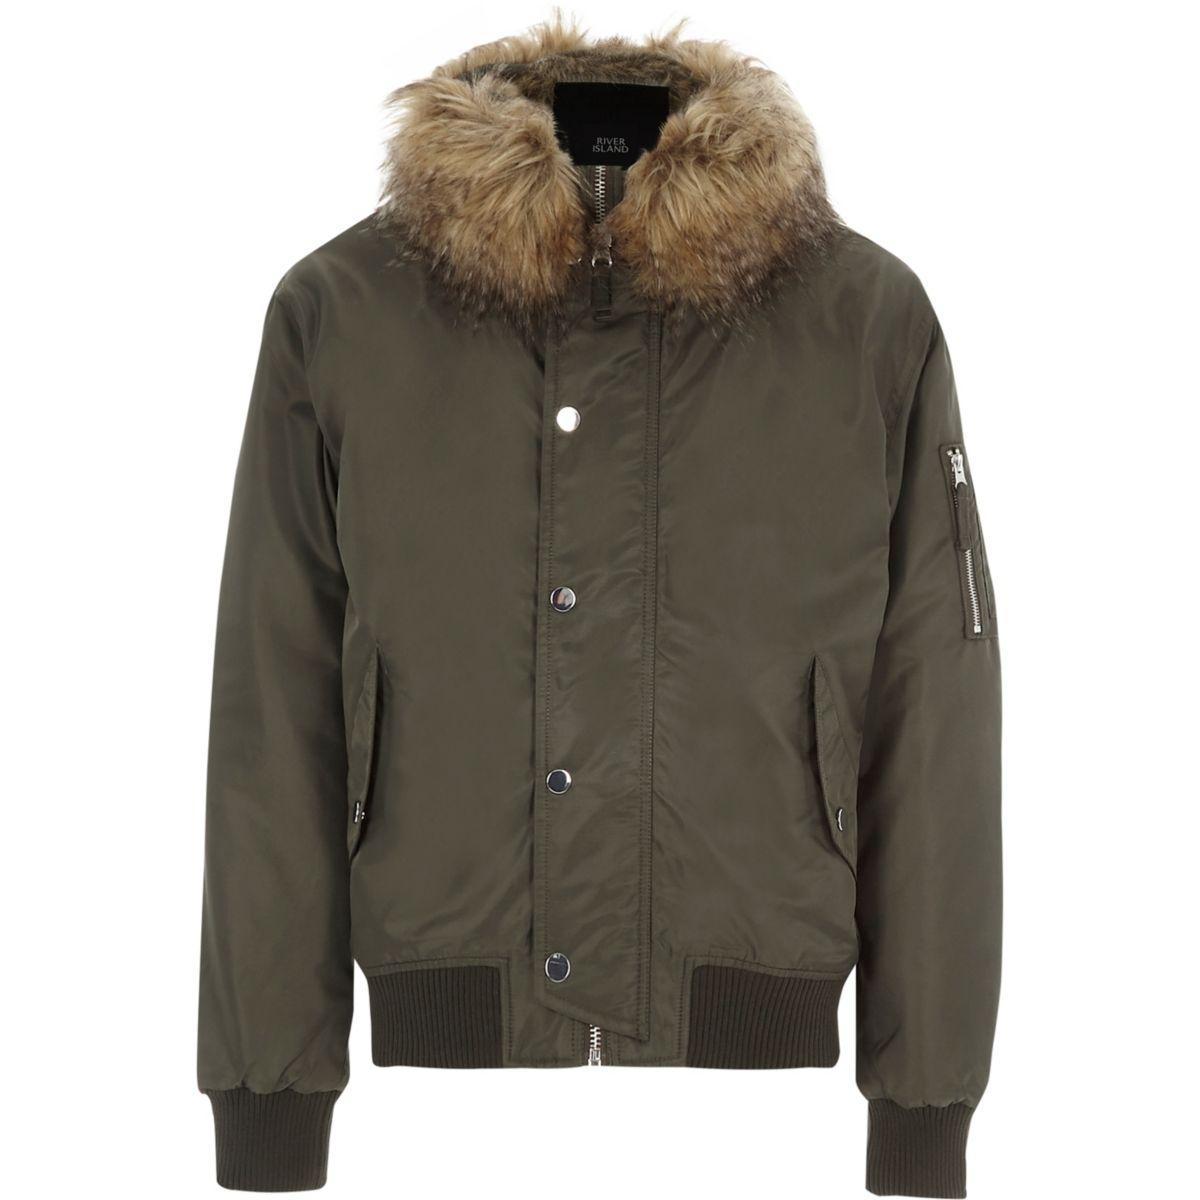 khaki green faux fur trim hooded jacket coats jackets sale men. Black Bedroom Furniture Sets. Home Design Ideas